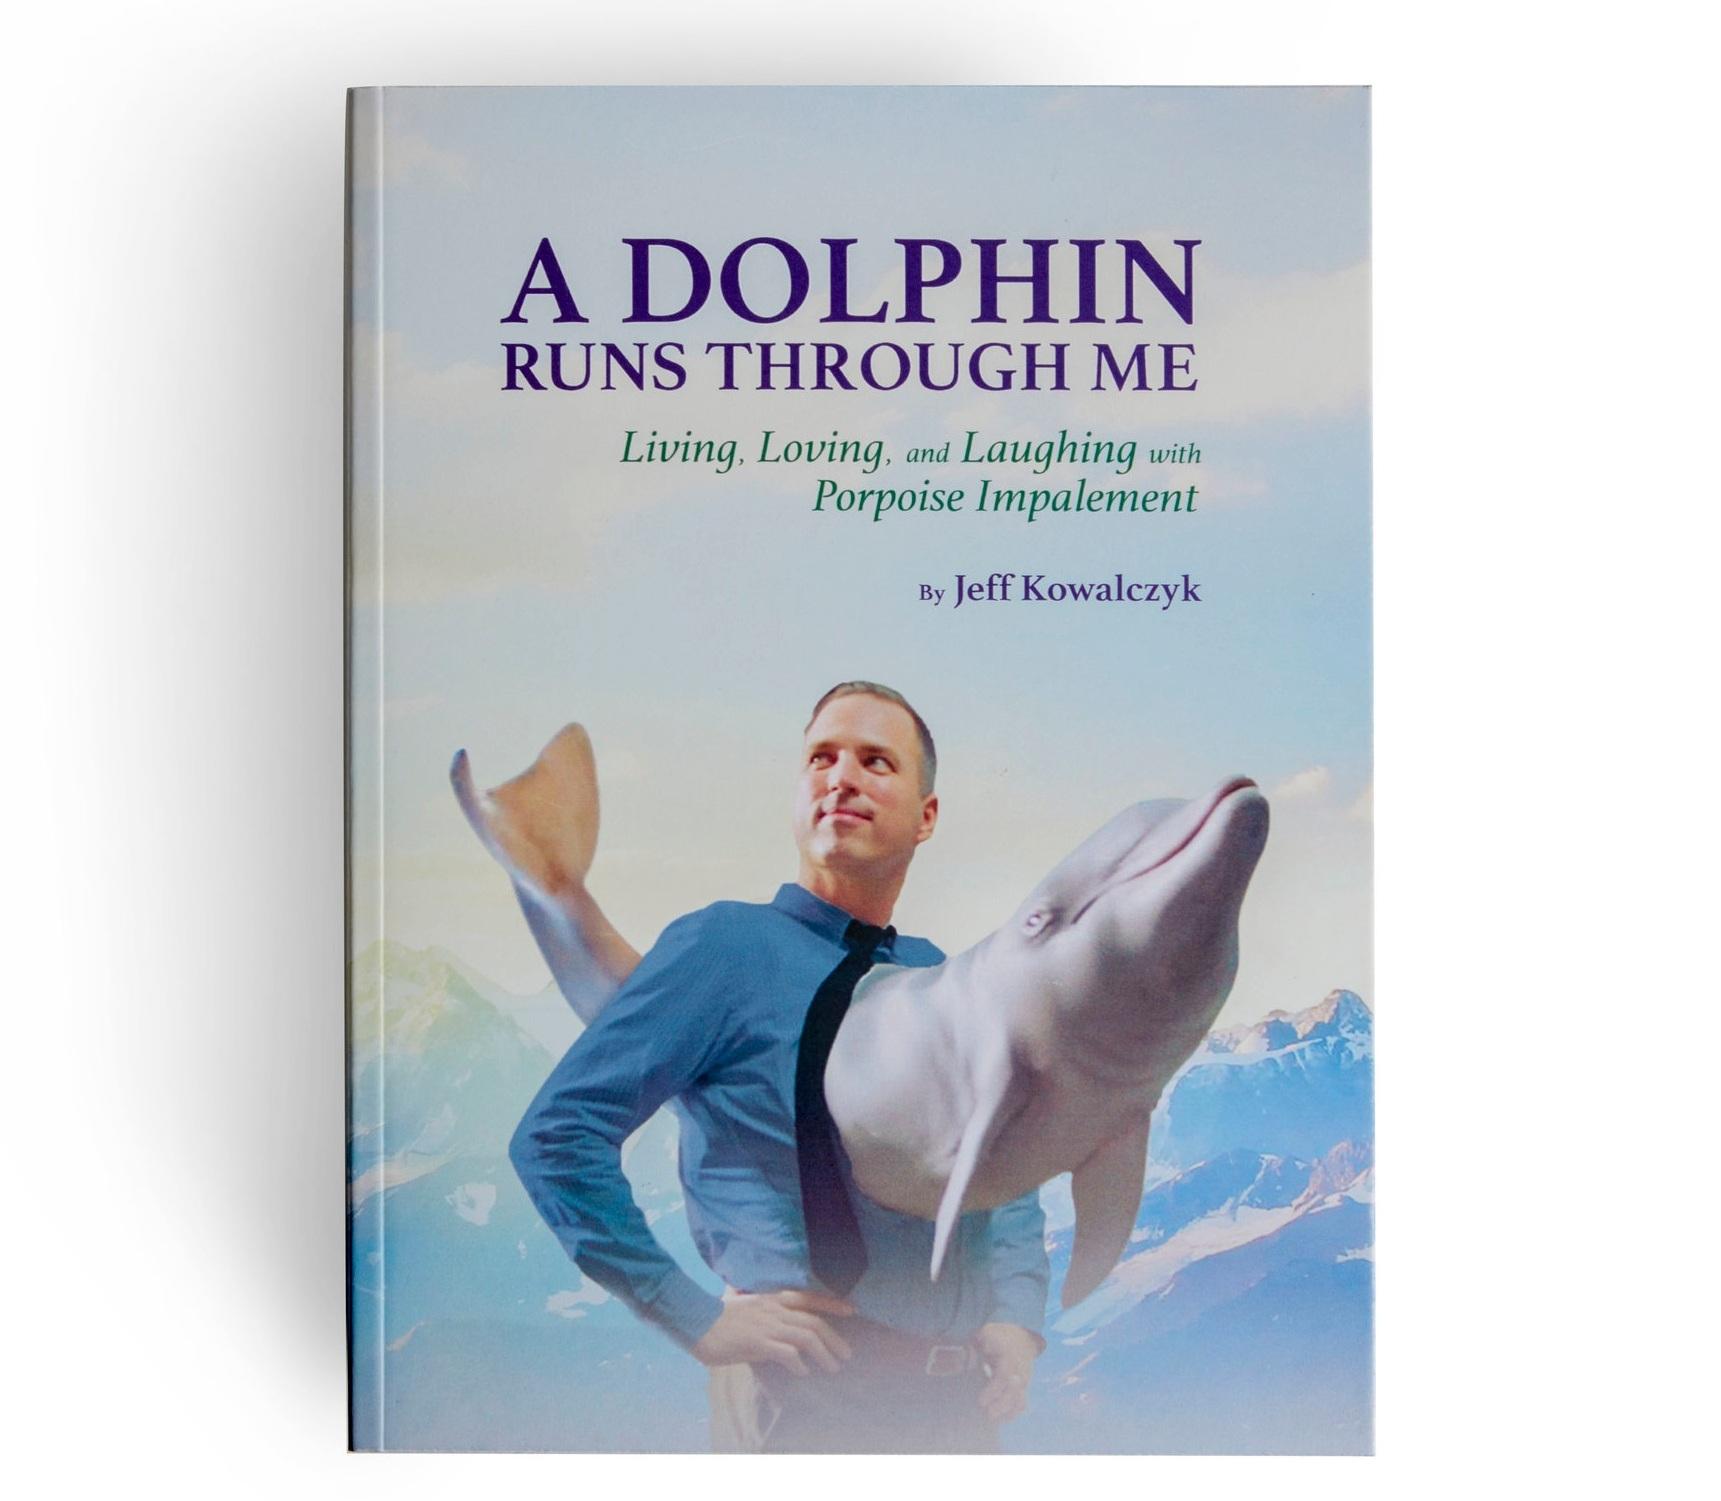 2018_POM_Dolphin_Book0859.jpg